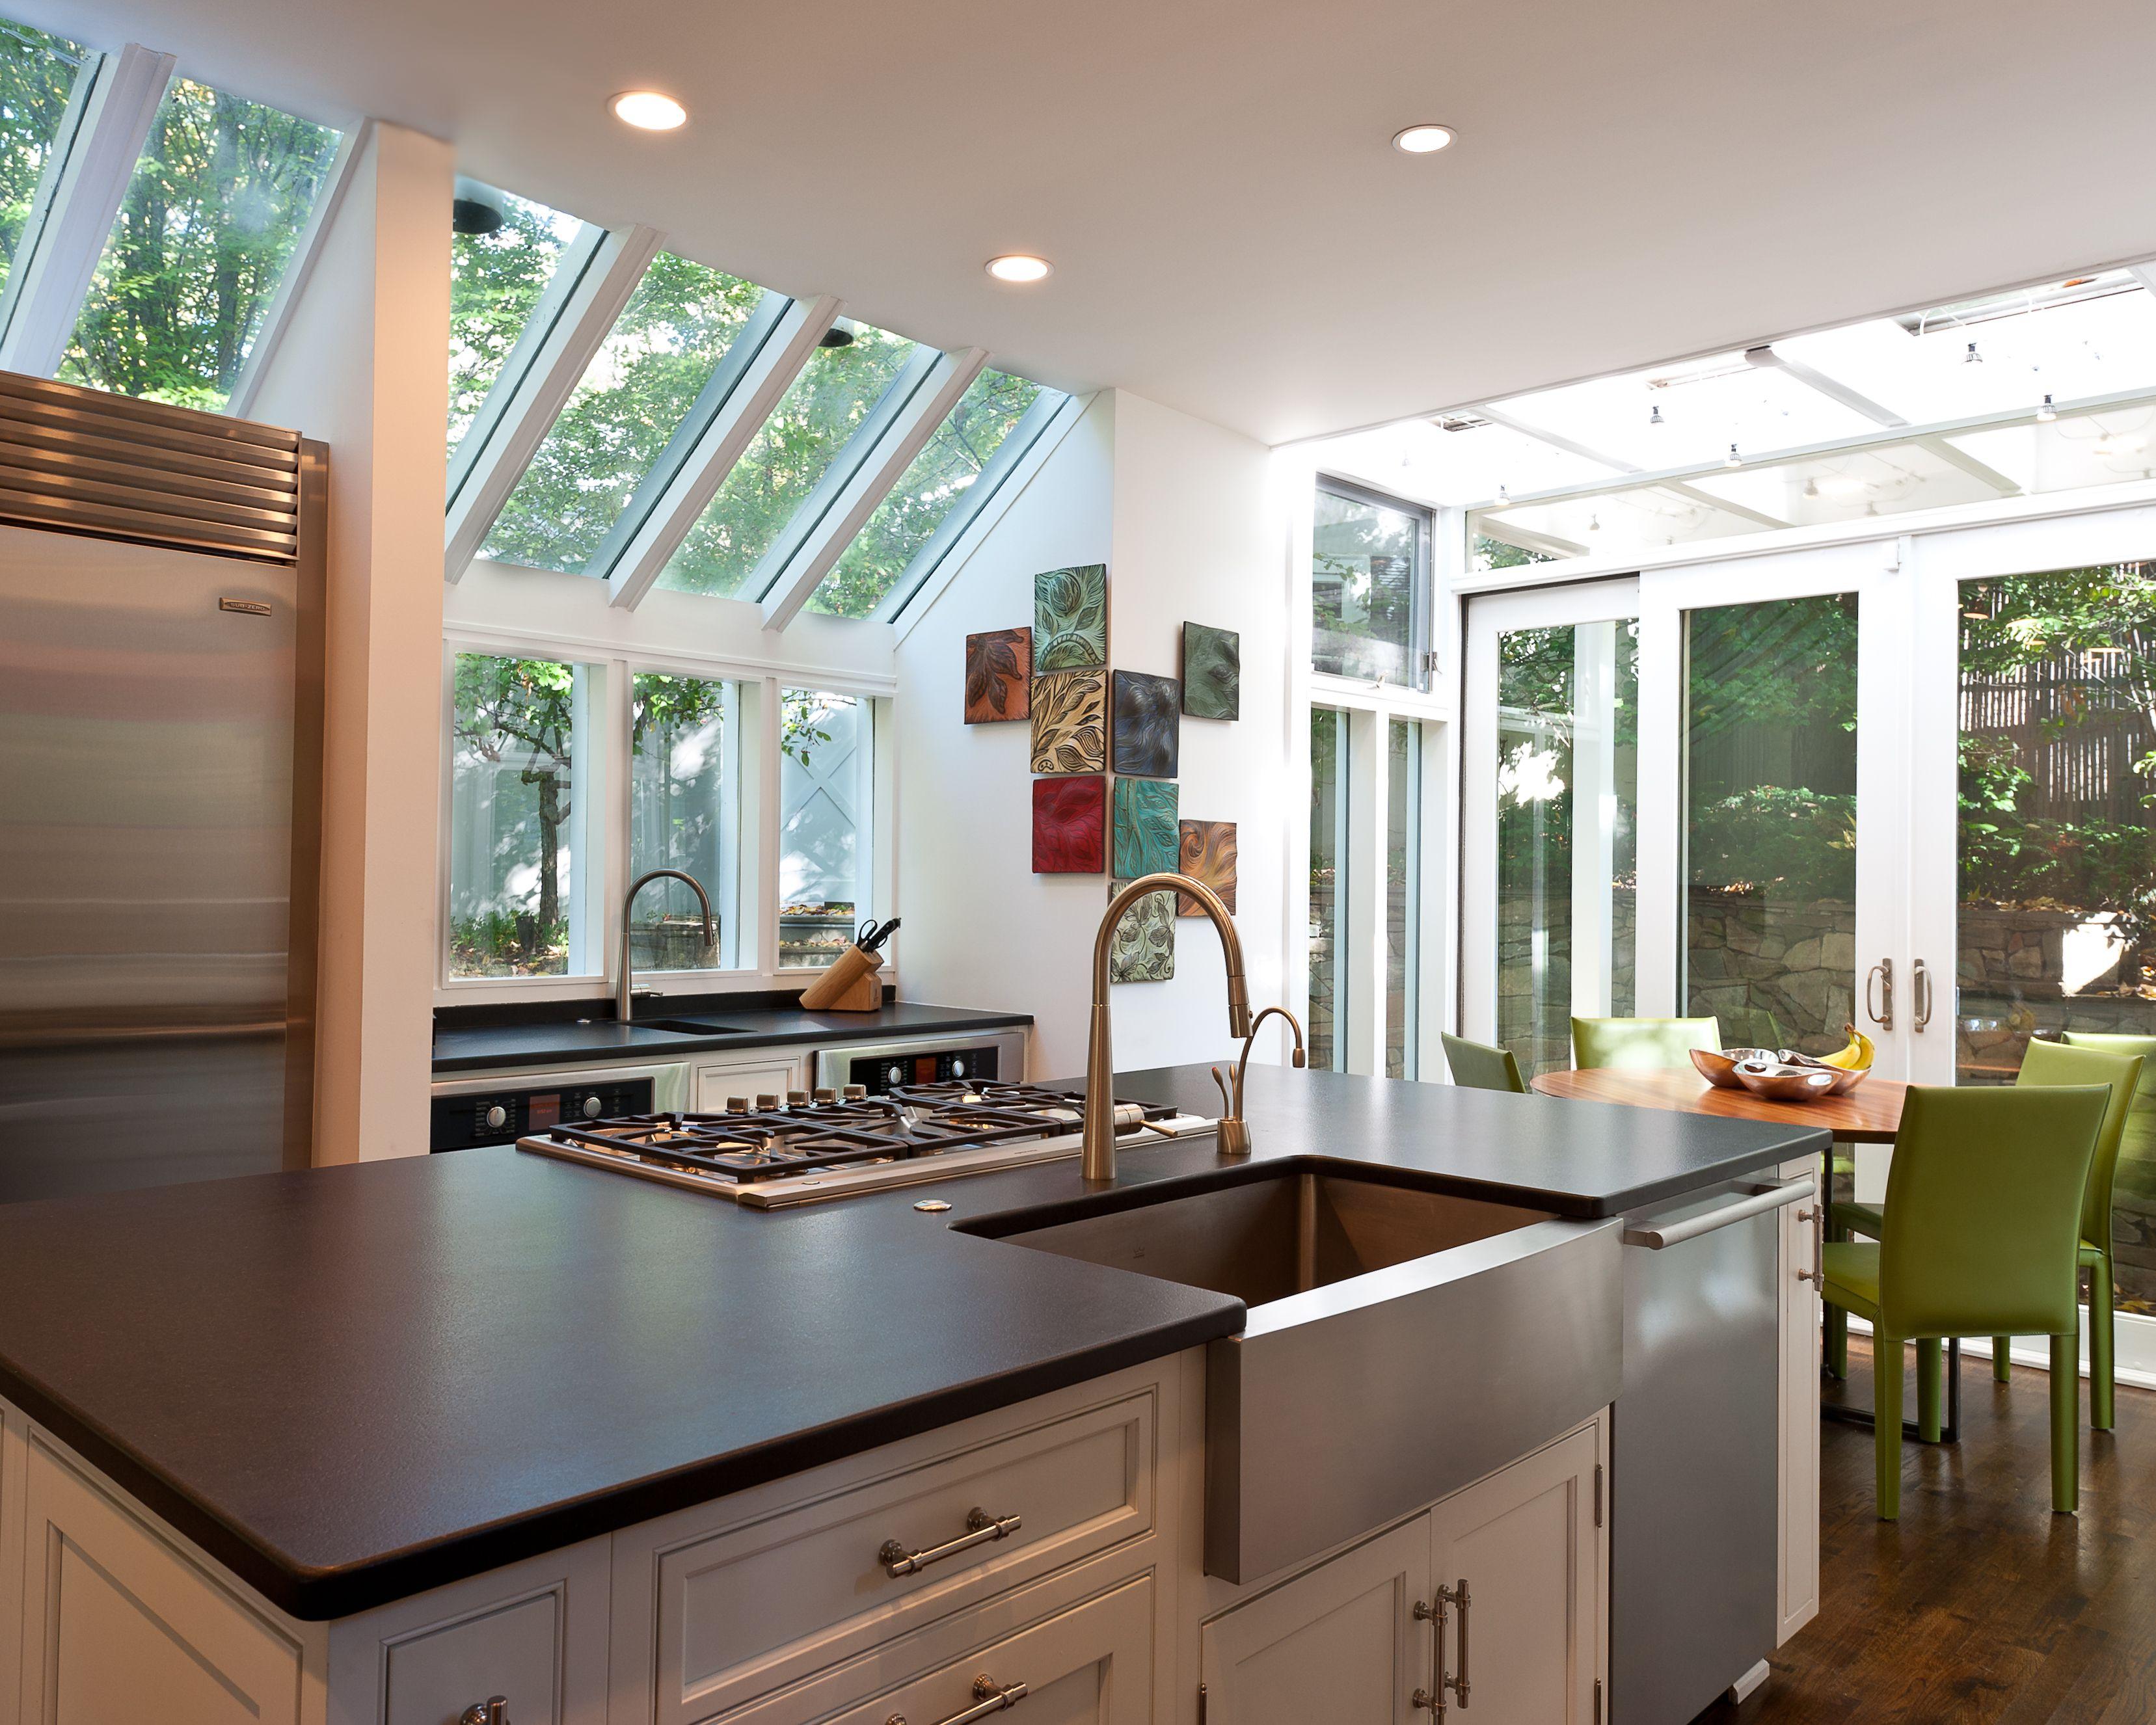 Modern white kitchen designed by kitchen elements of olney maryland